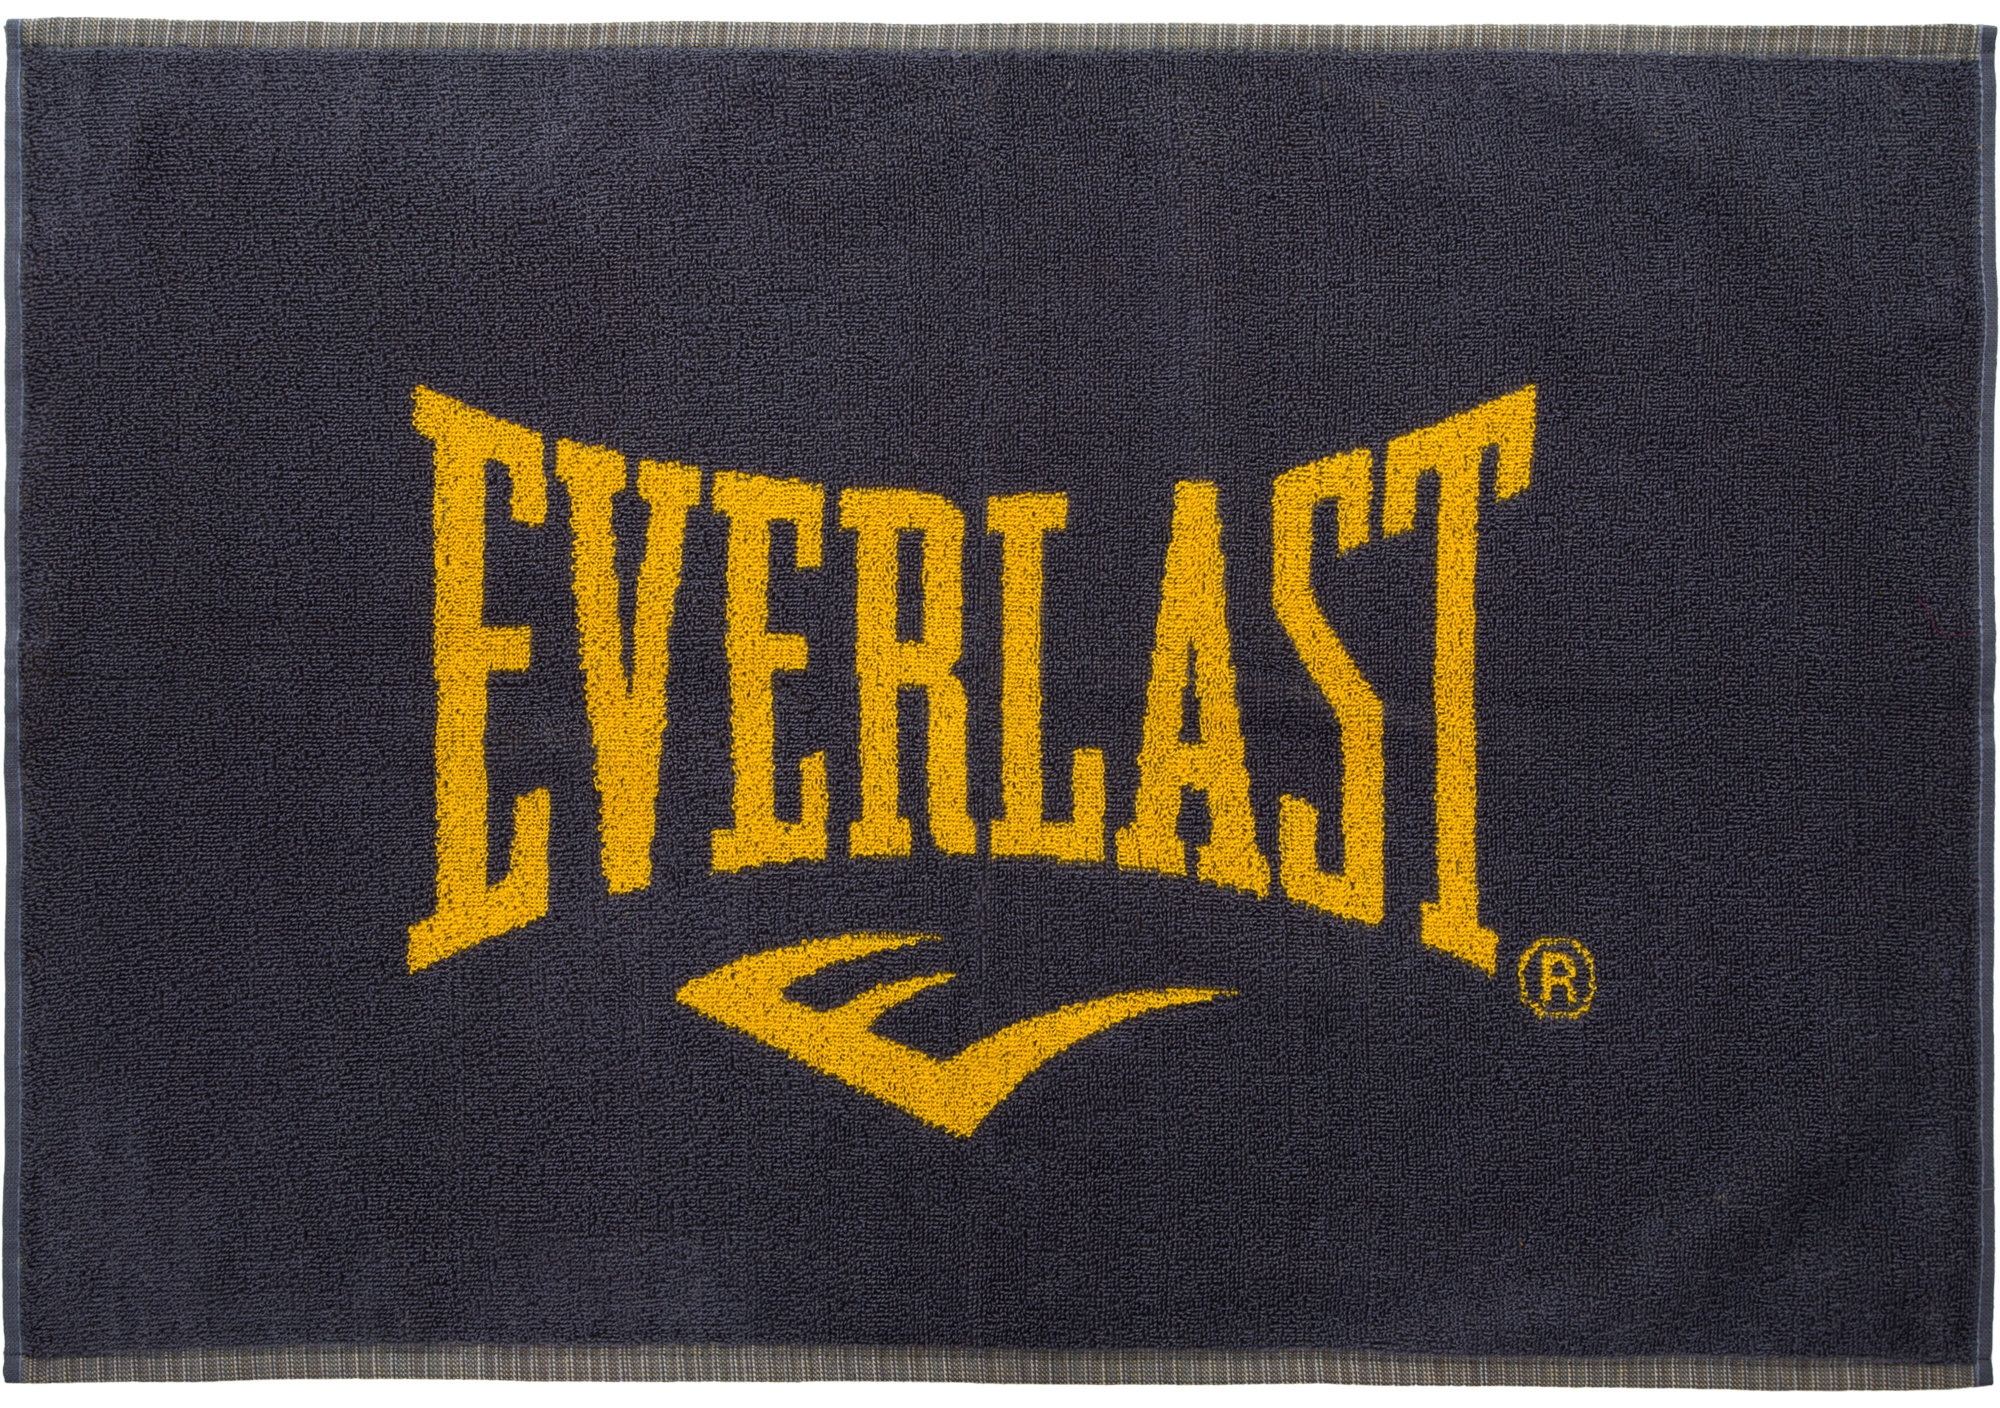 Everlast Полотенце махровое Everlast, 70 х 50 см